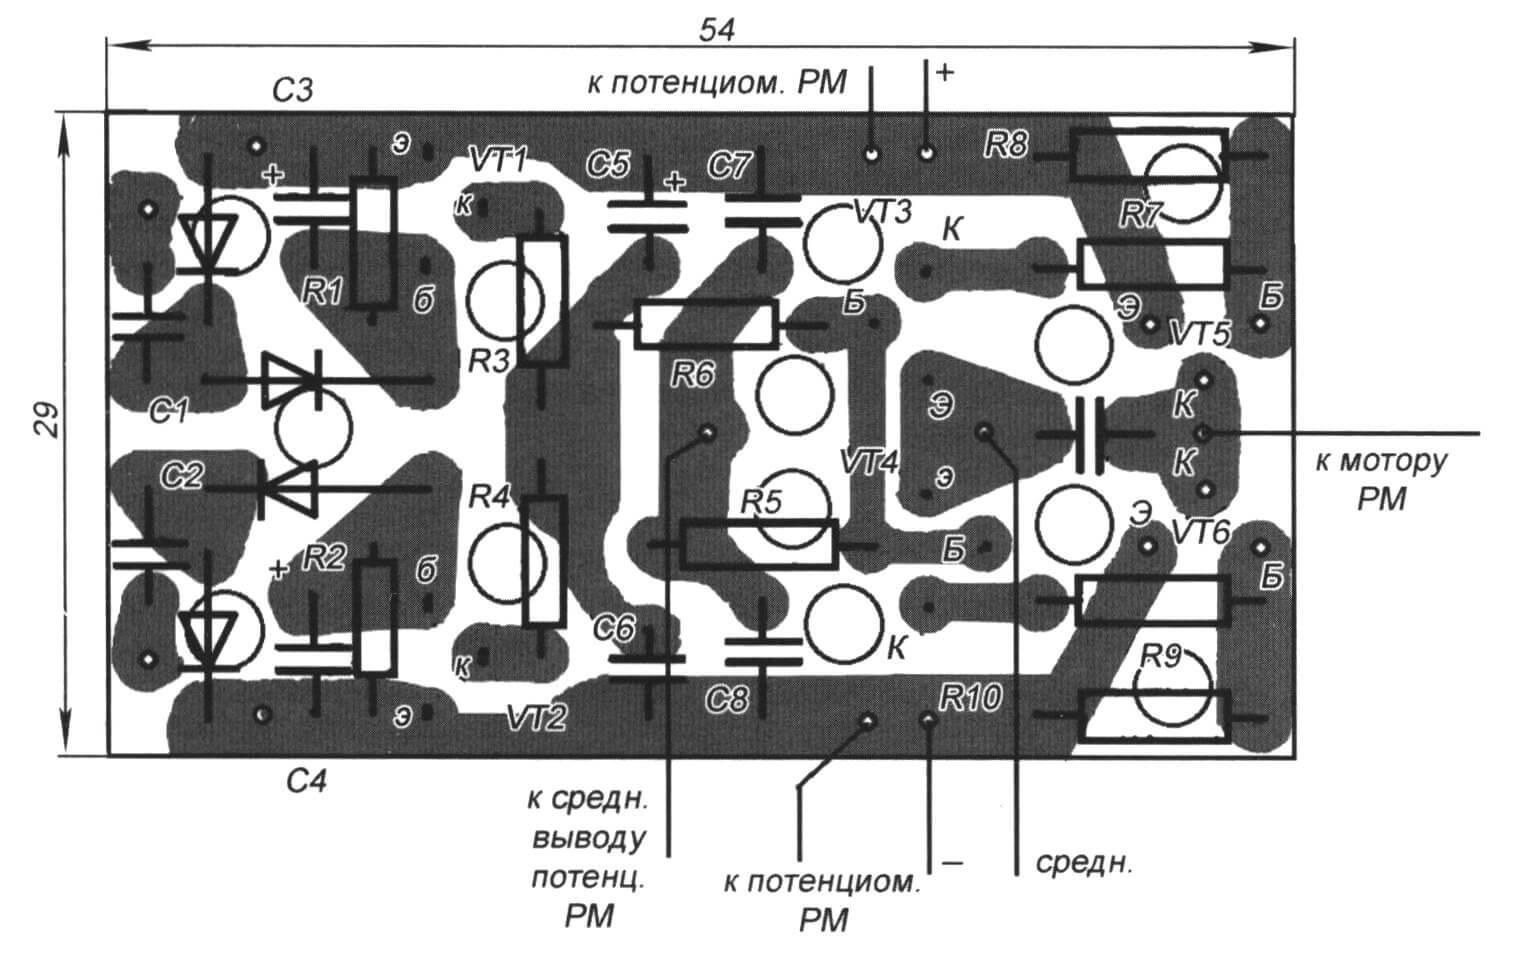 Рис. 5. Печатная плата модуля УРМ